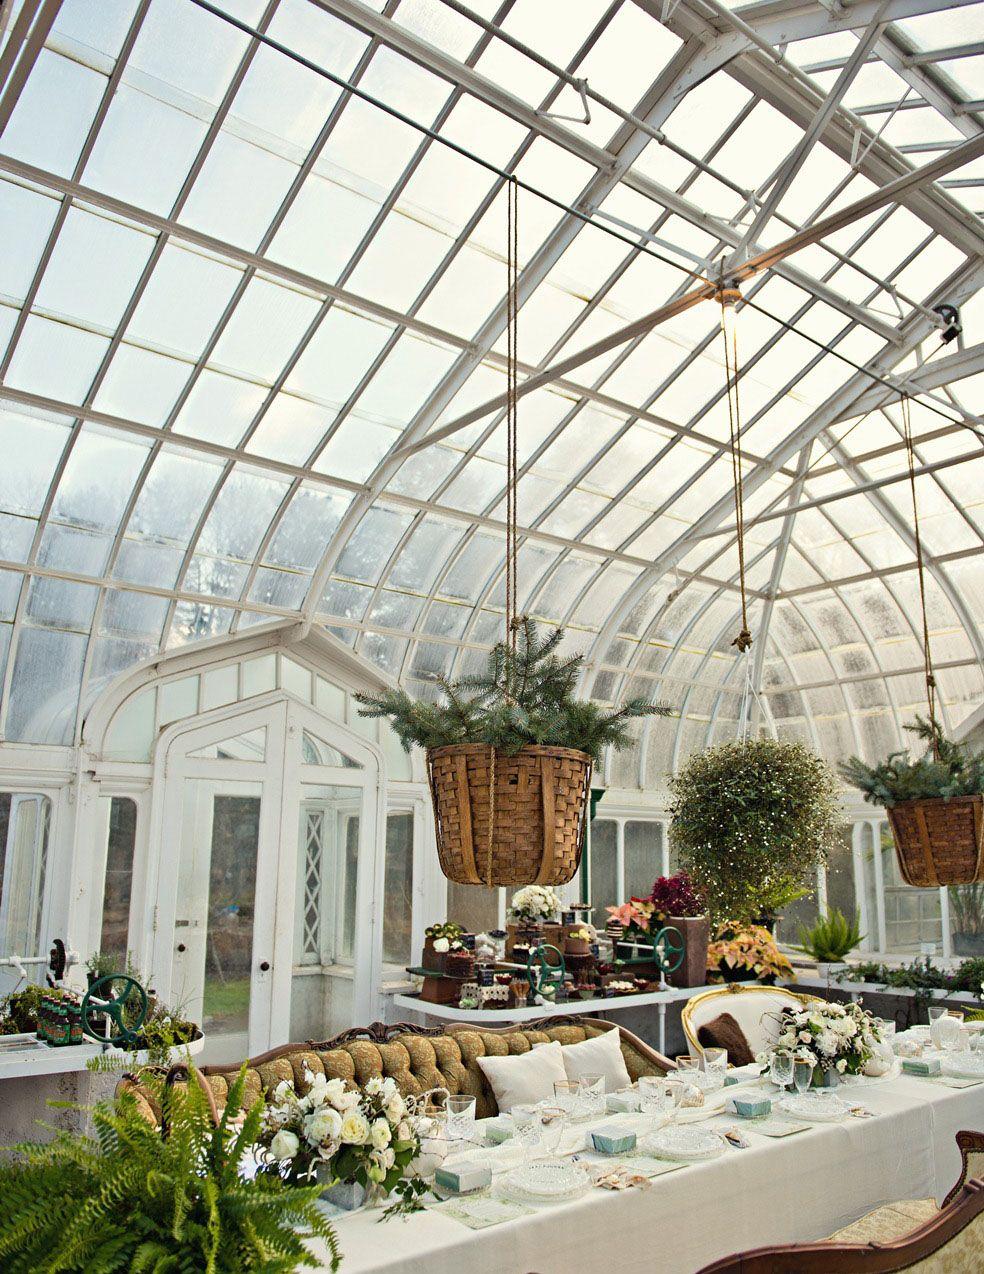 THE CEDARS AT HILLSIDE FARMS | HOME | wedding stuff I luv ...